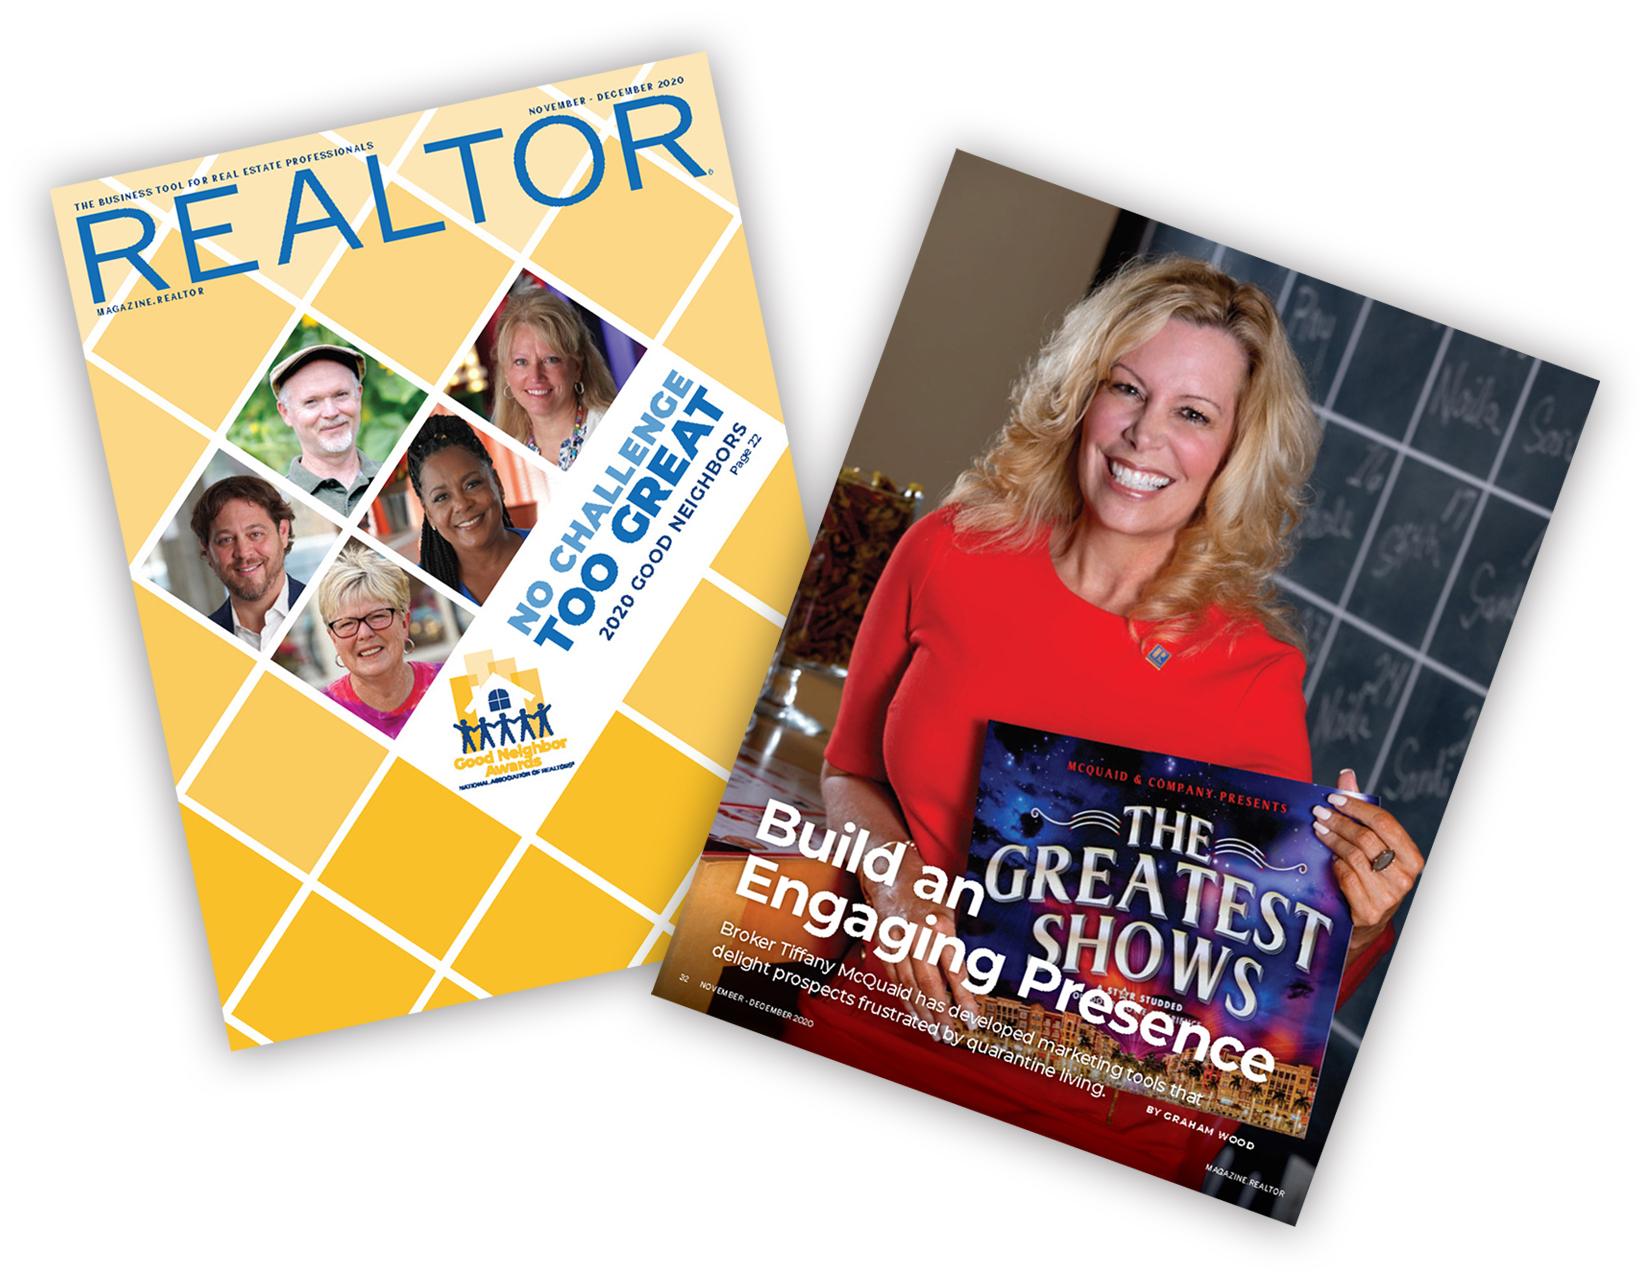 Realtor Magazine - No Challenge Too Great